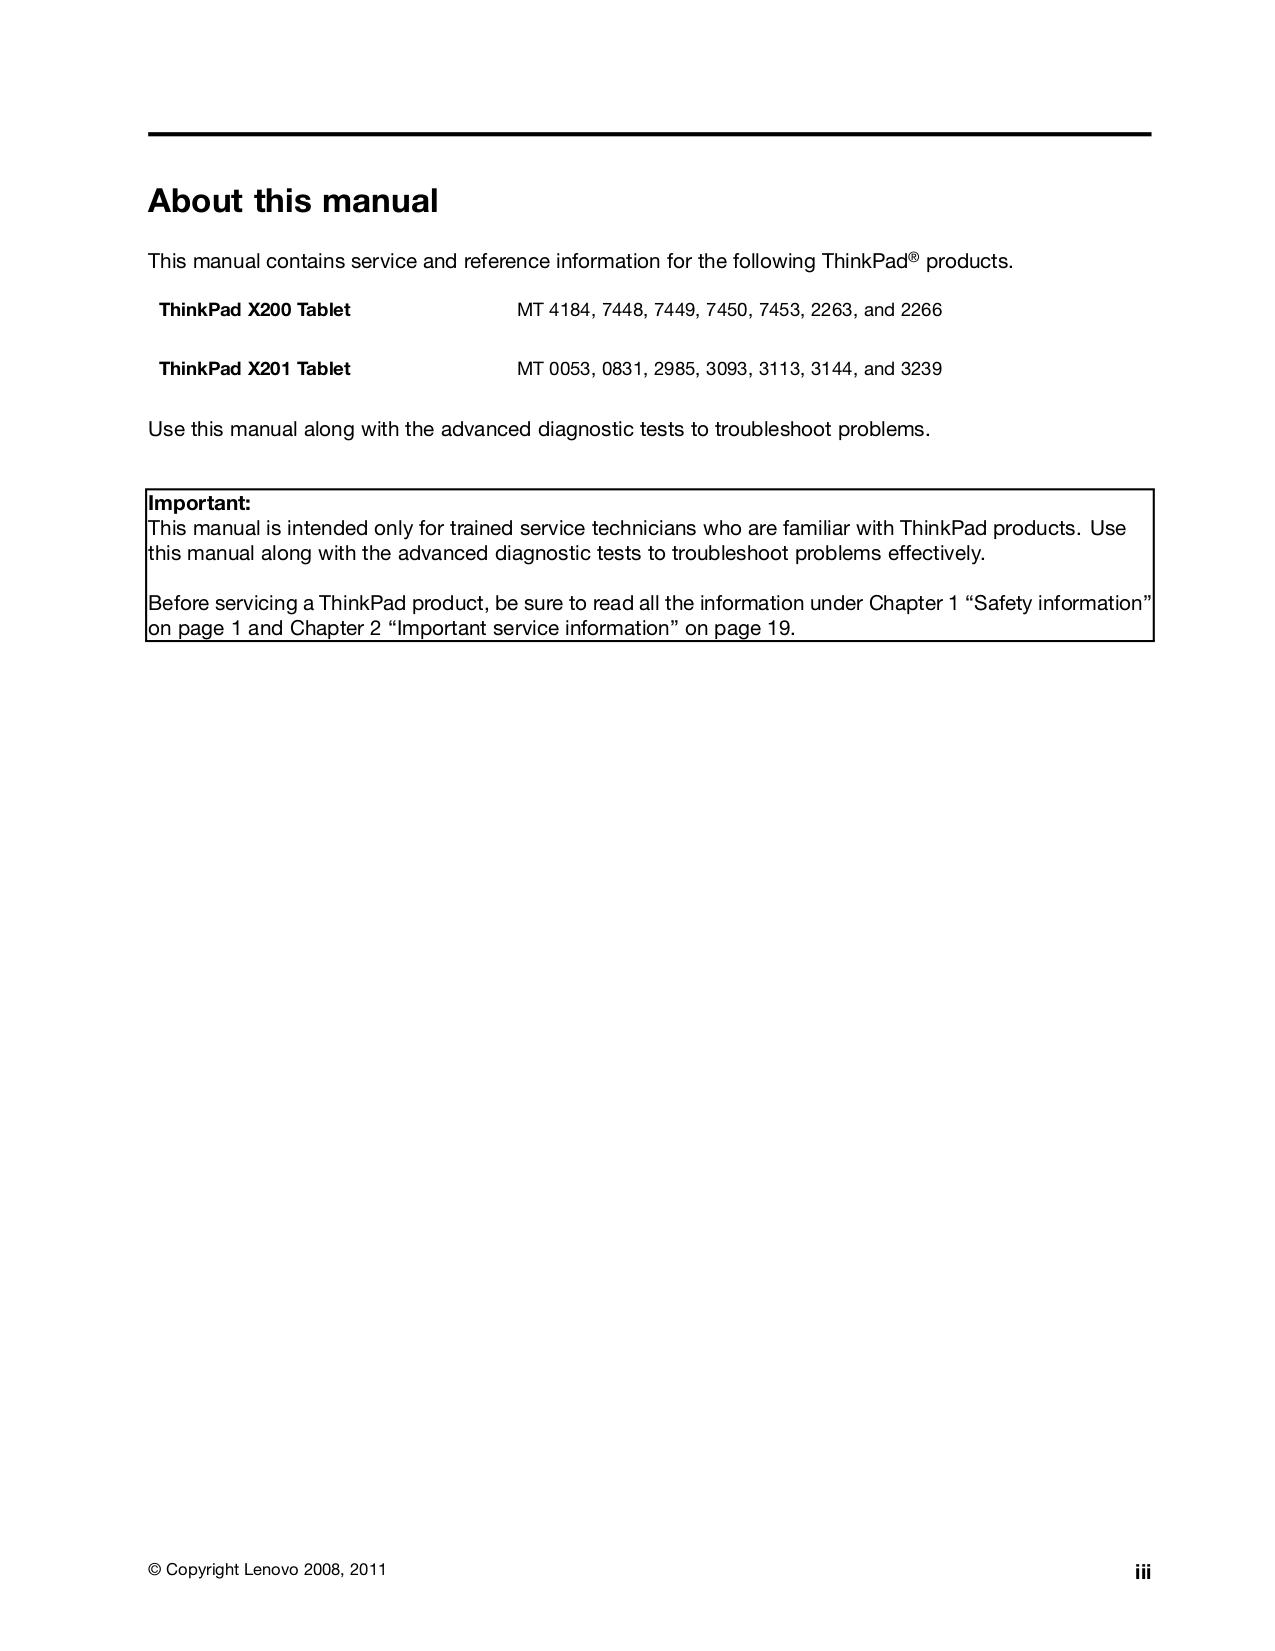 PDF manual for Lenovo Laptop ThinkPad X201 Tablet 3113